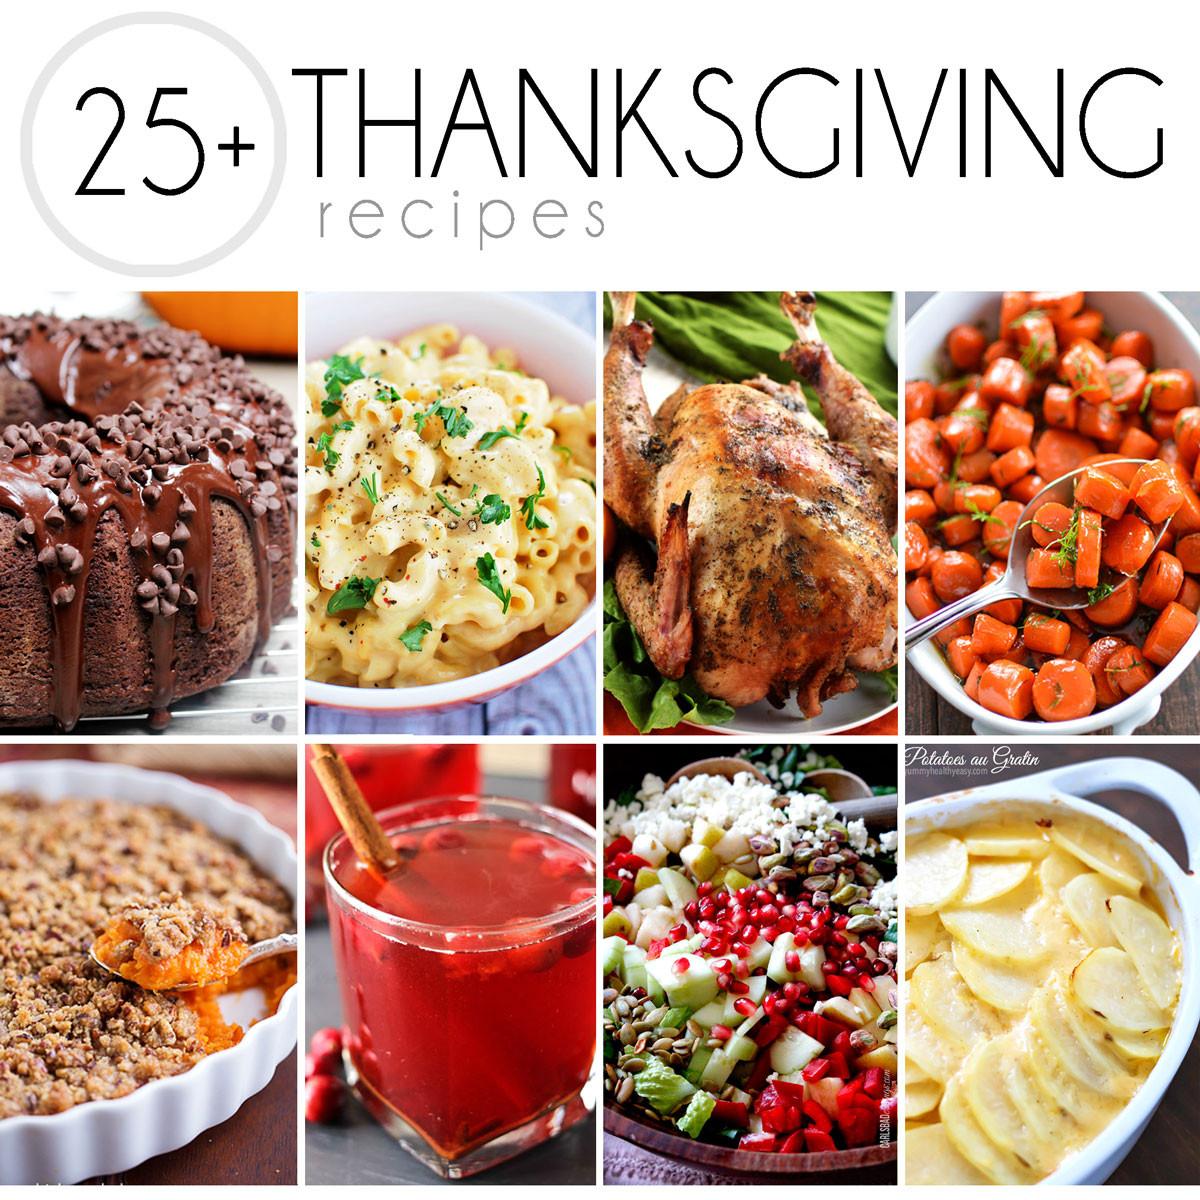 Recipes For Thanksgiving Dinner  25 Thanksgiving Recipes